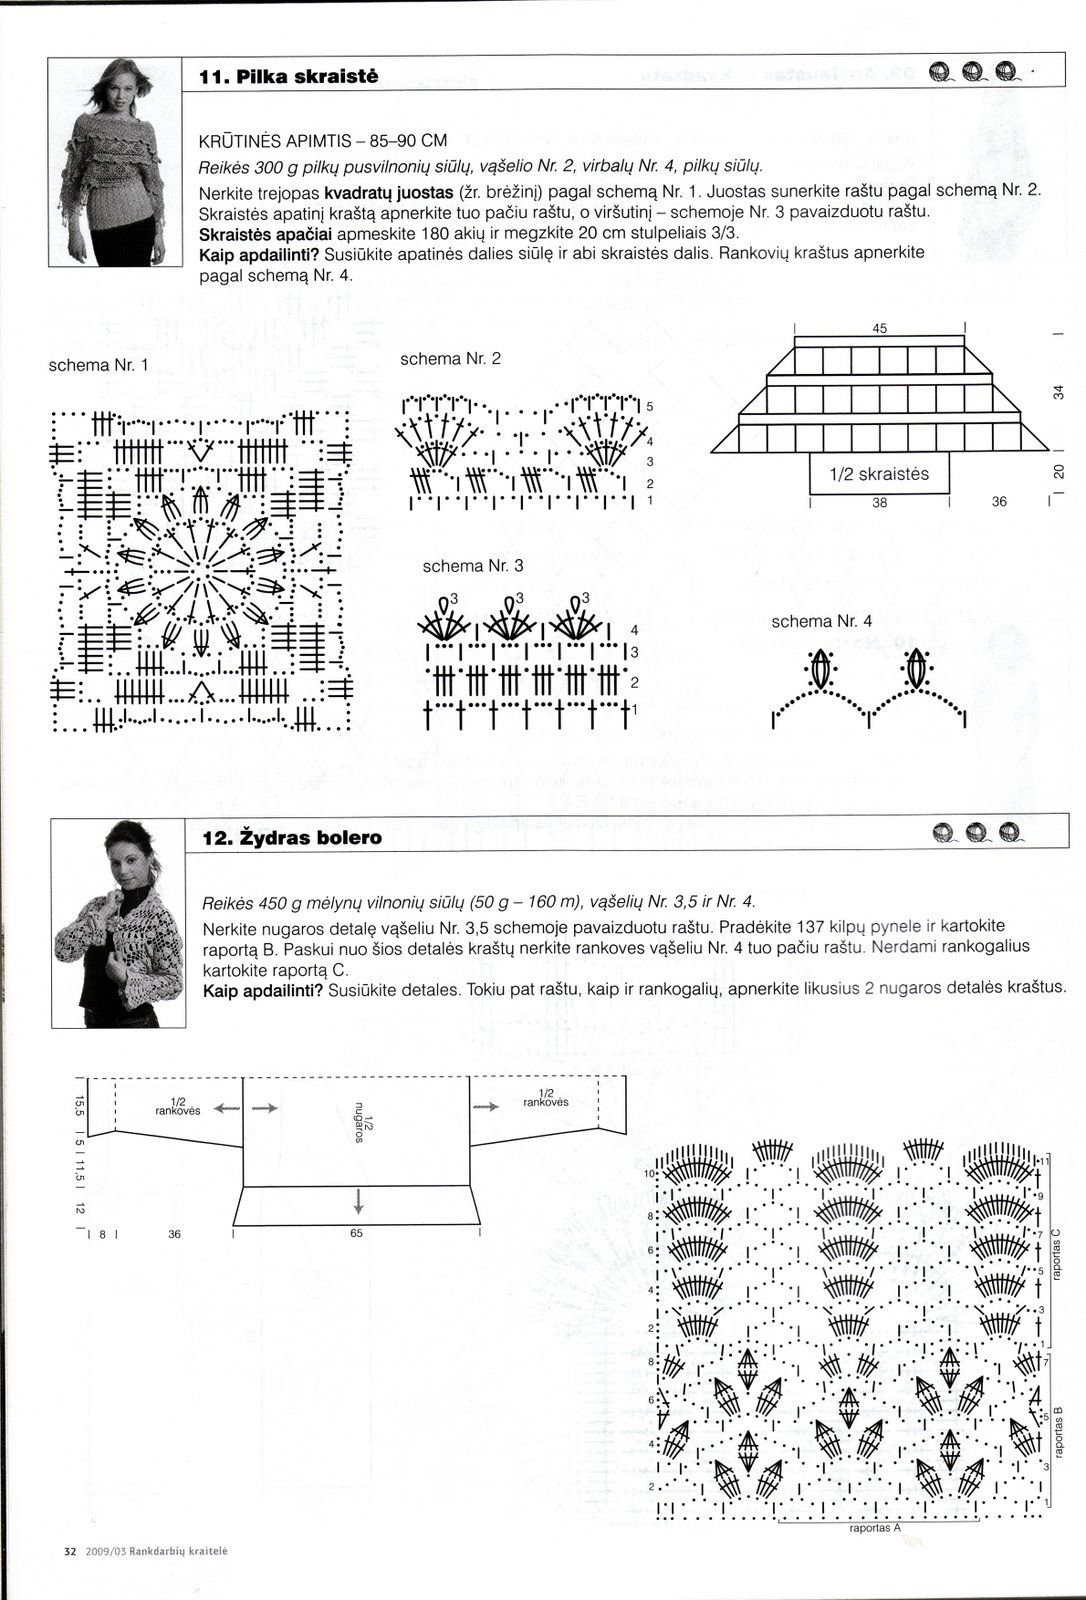 BLUSA CROCHET MARAVILLOSO CON PATRÓN GRAFICO   Crochet   Pinterest ...